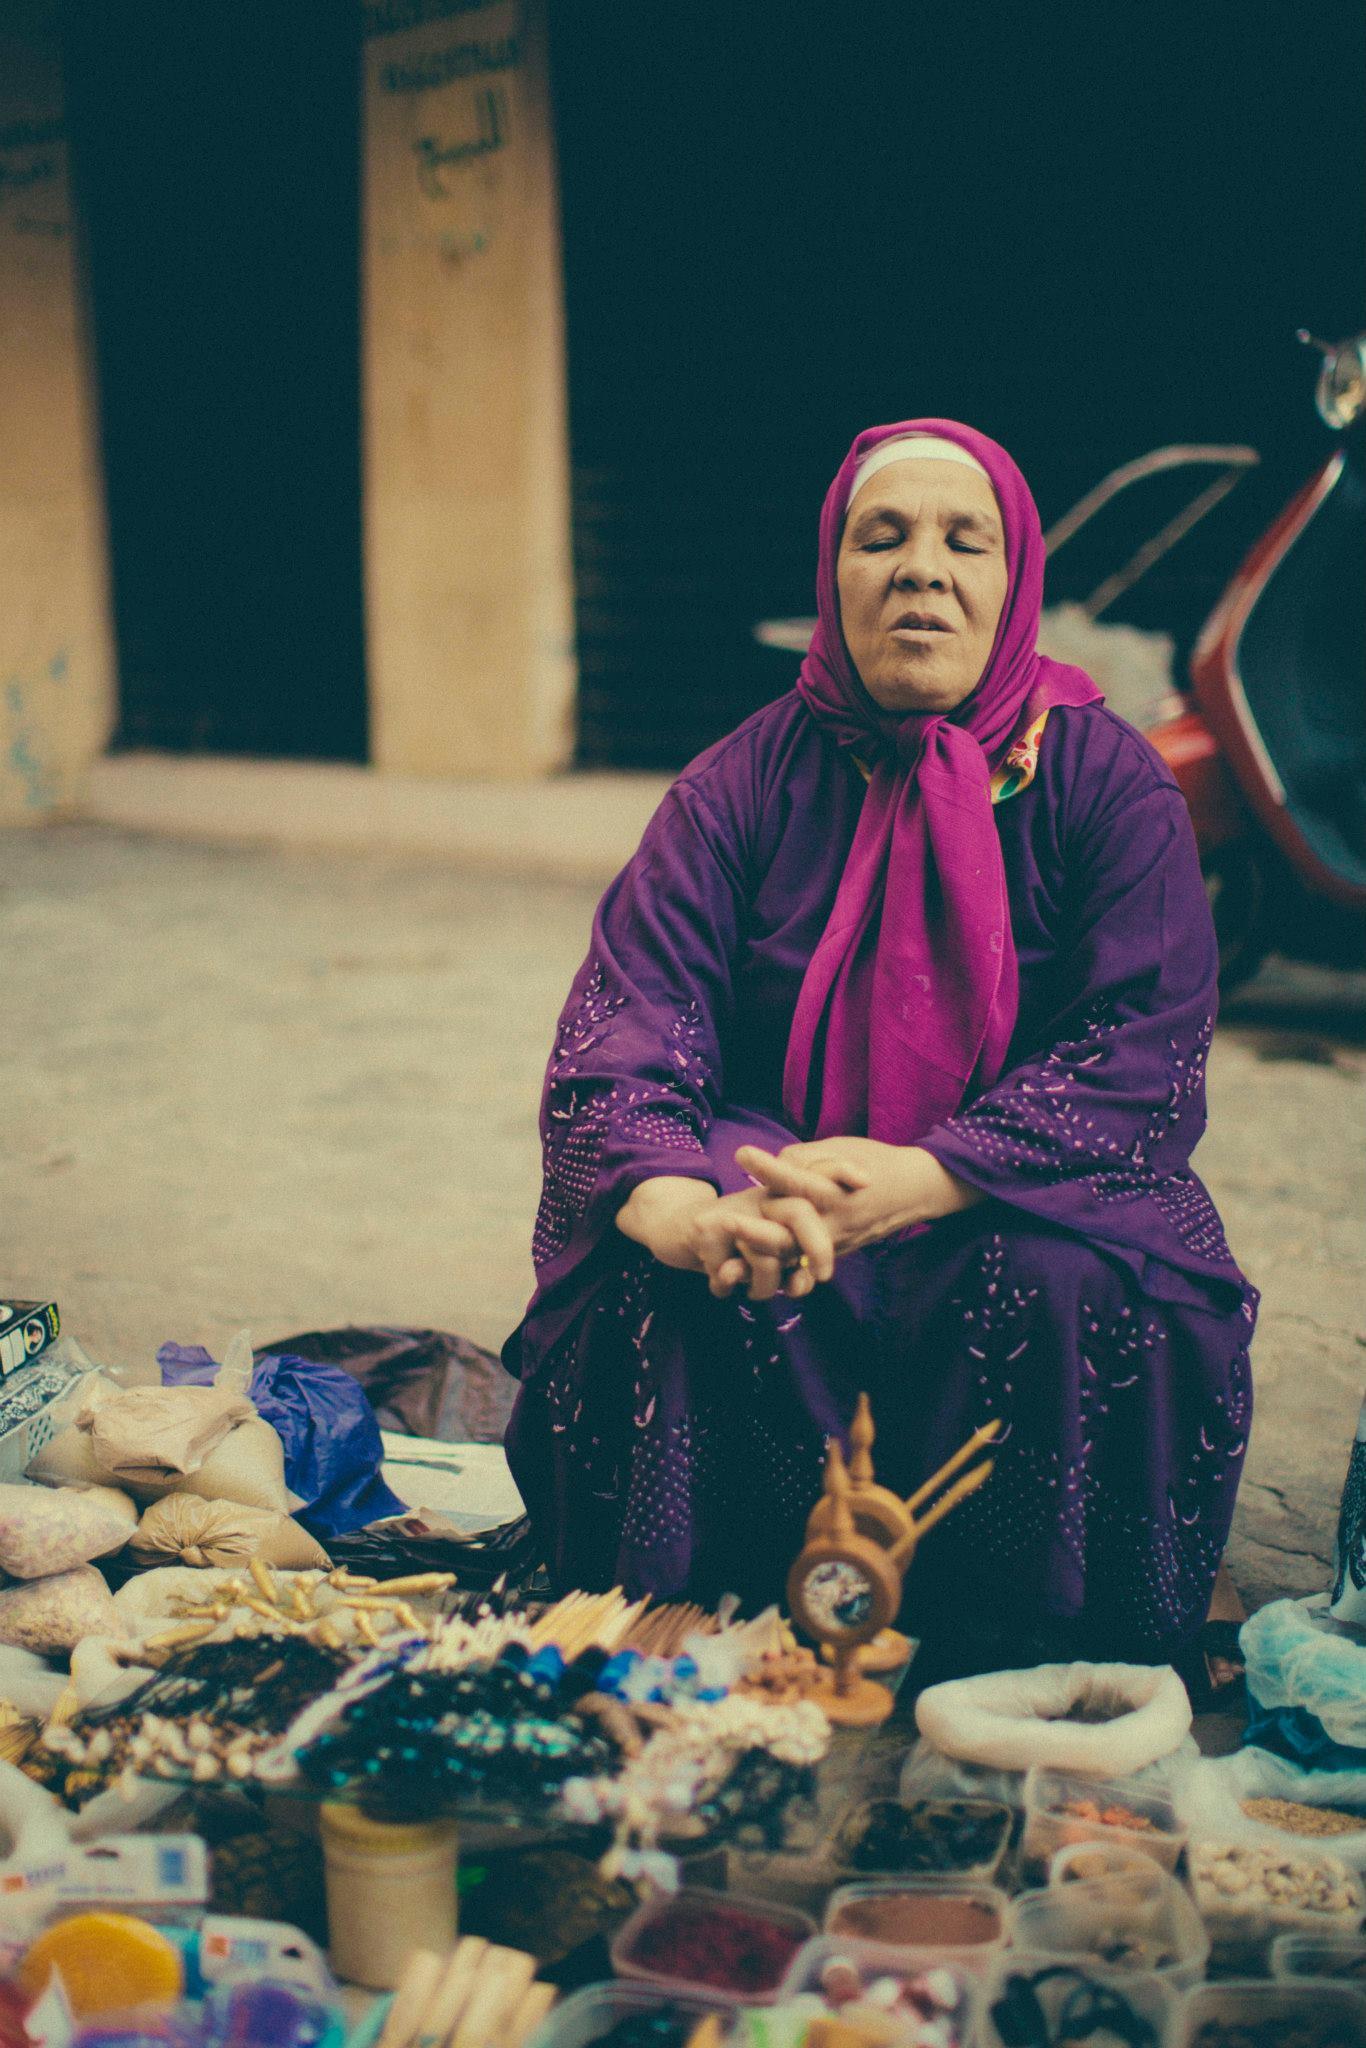 Moroccan Street Vendor